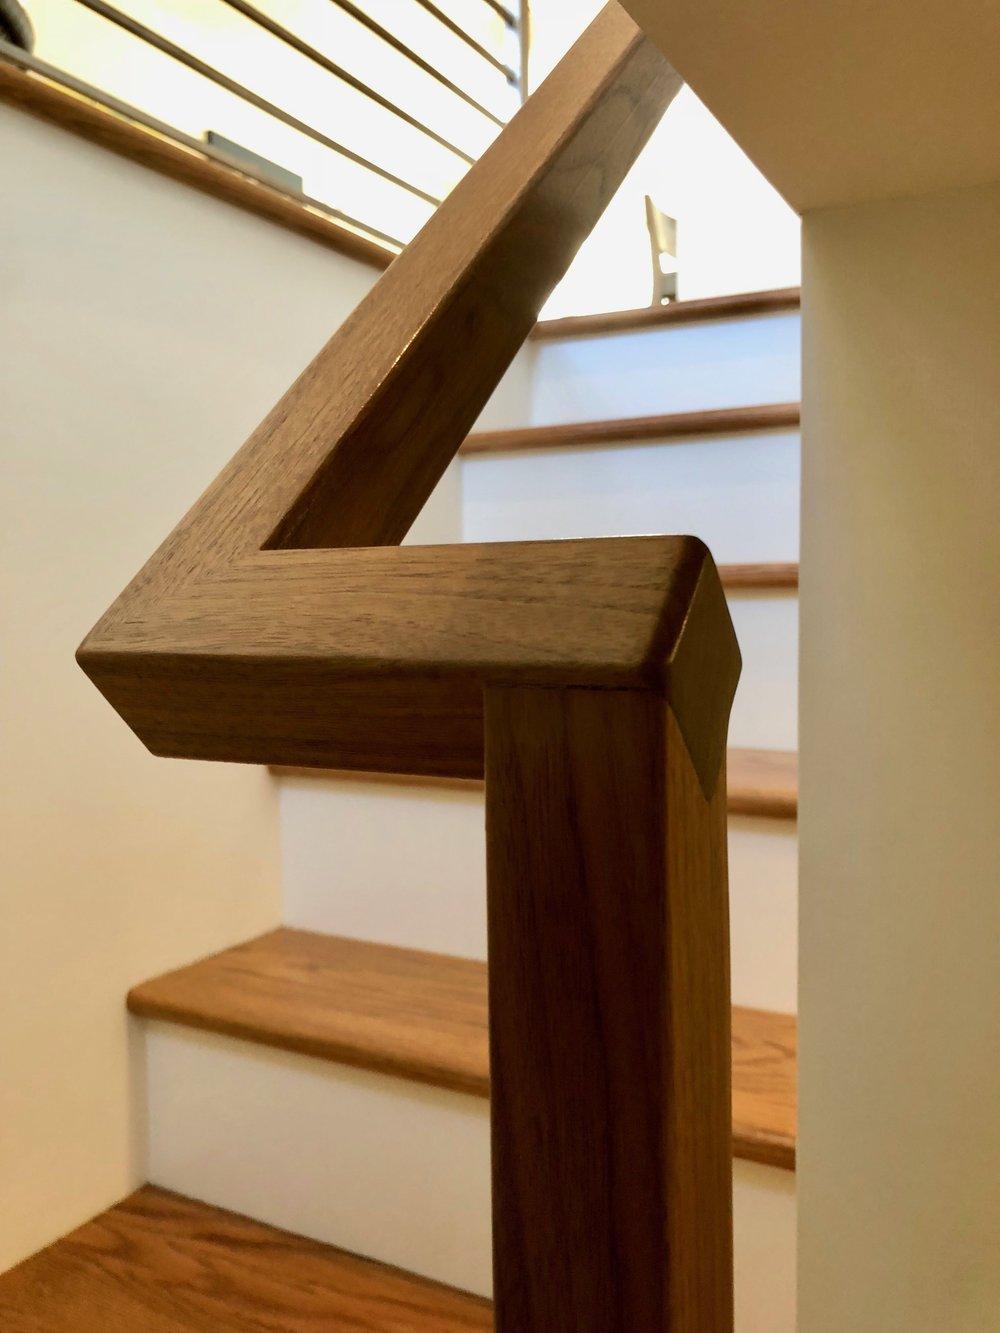 Handrail1.jpg